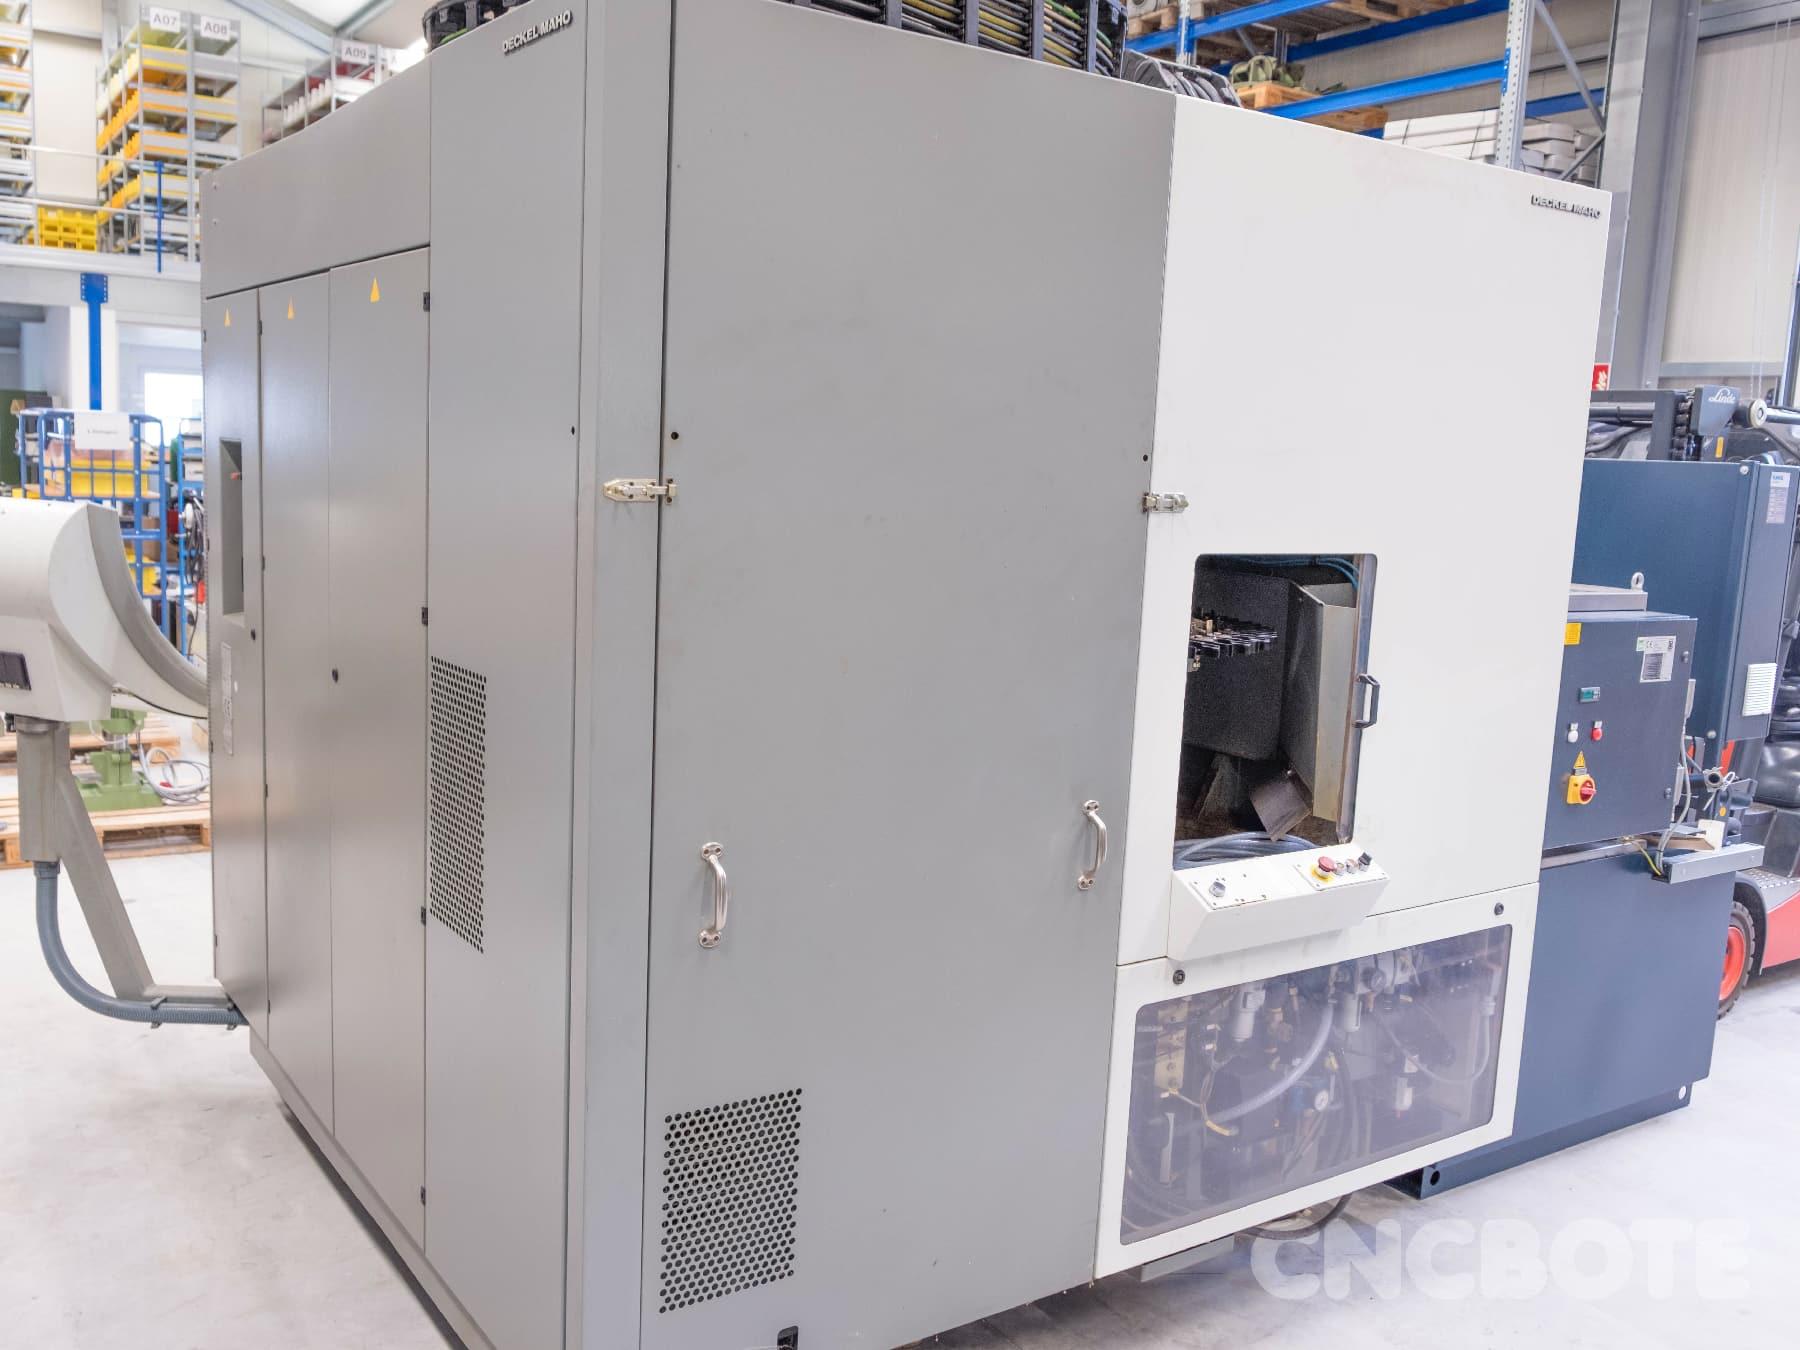 Dmg deckel maho dmc 65v cnc machining center buy used for Dmg deckel maho